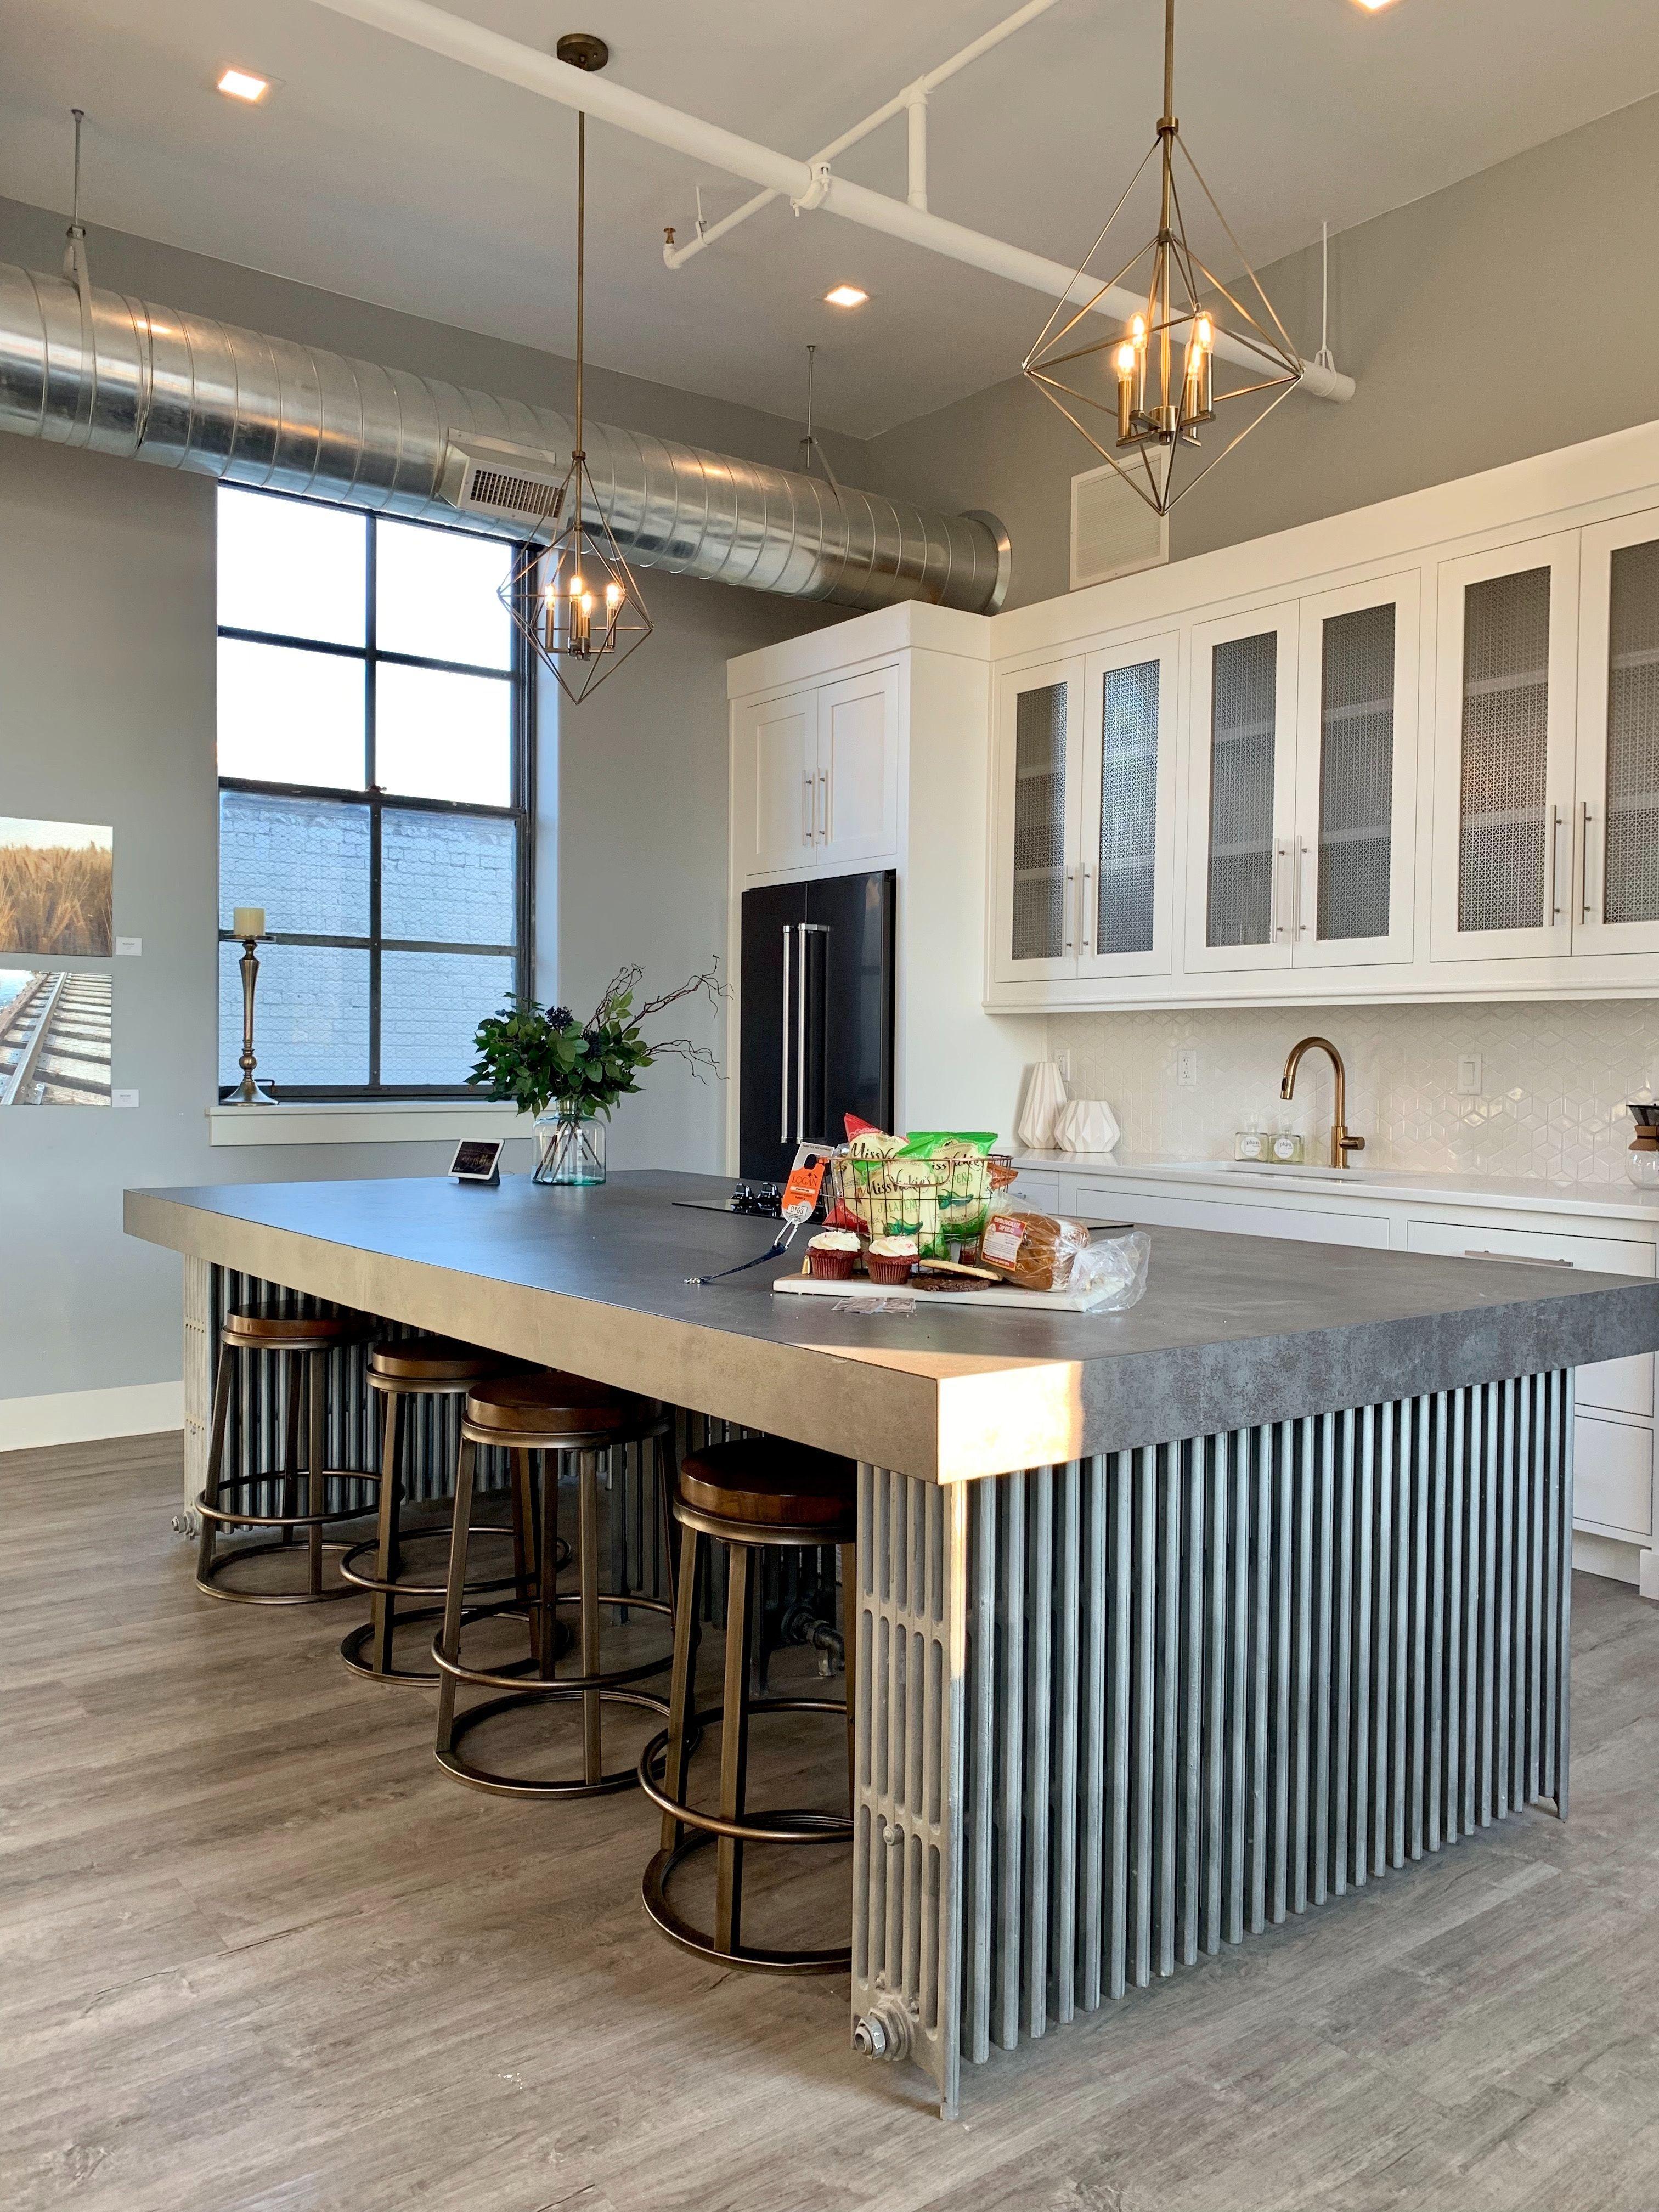 Rustic Modern kitchen decor ideas | Contemporary kitchen ...